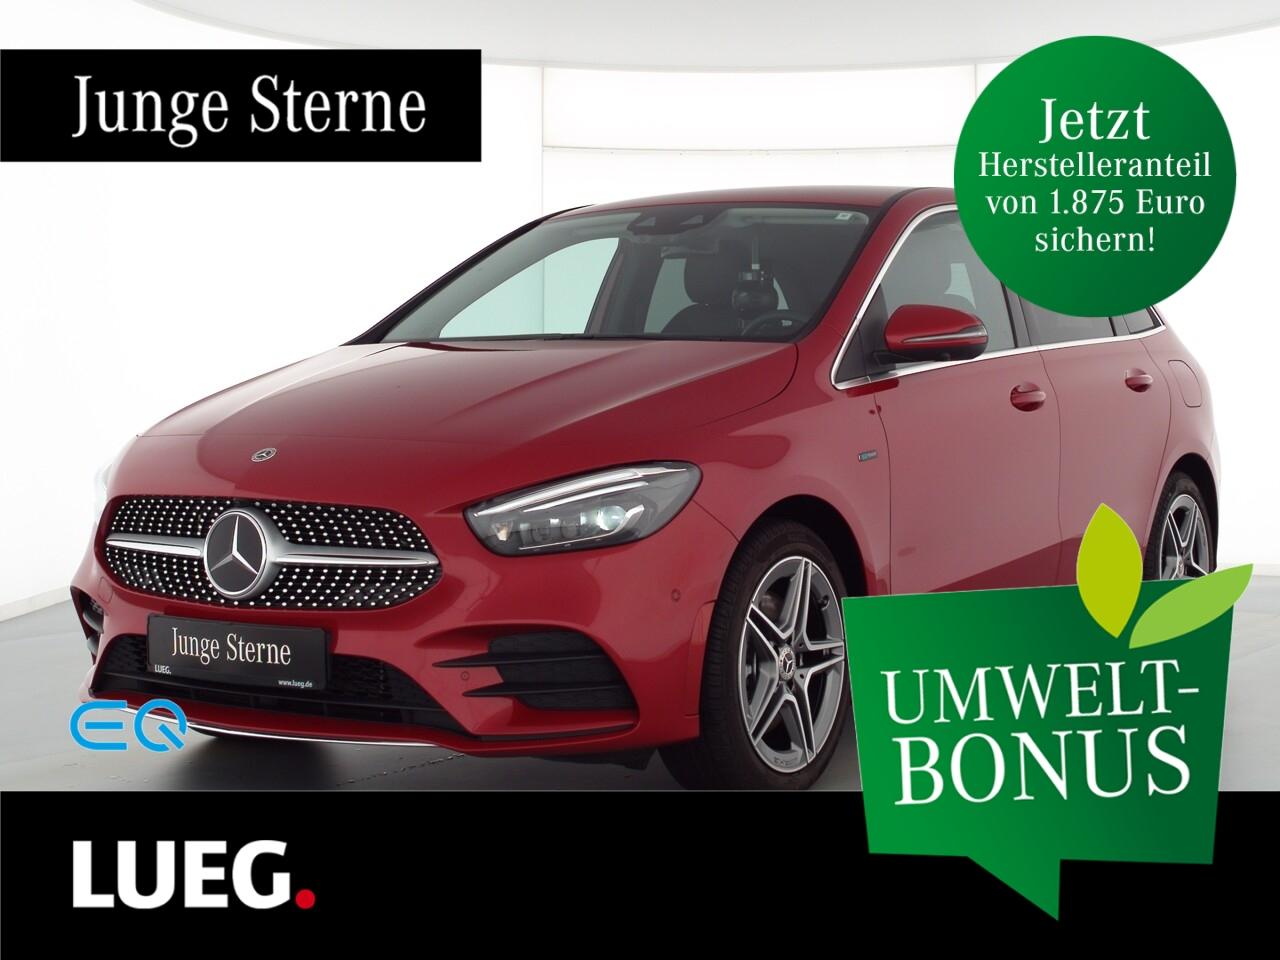 Mercedes-Benz B 250 e AMG+MBUXHighE+Mbeam+AHK+Distr+Sound+360°, Jahr 2020, Hybrid